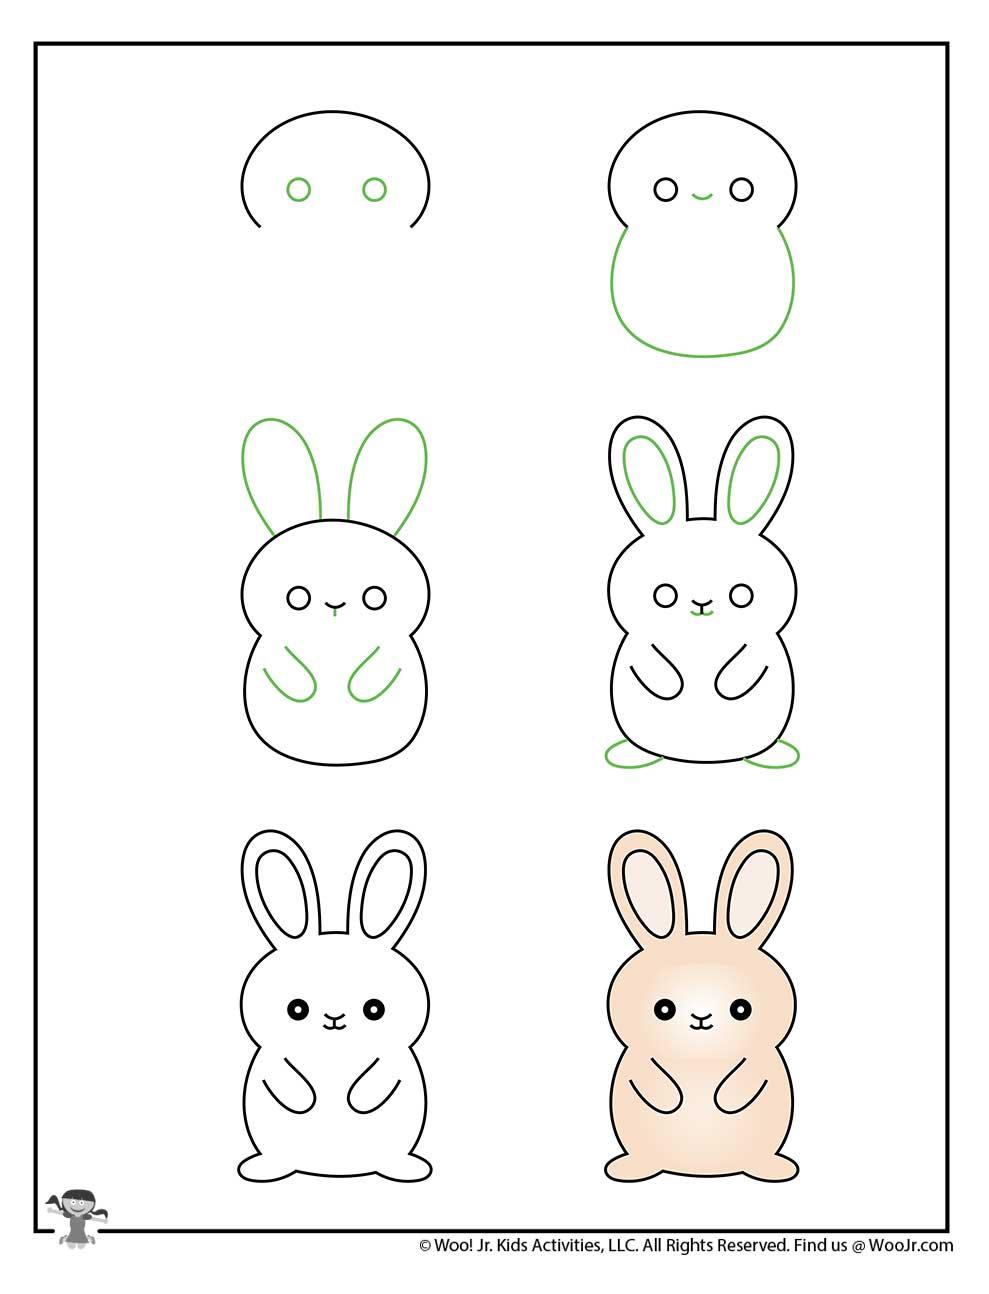 Bunny Drawing Step by Step Kids | Woo! Jr. Kids Activities